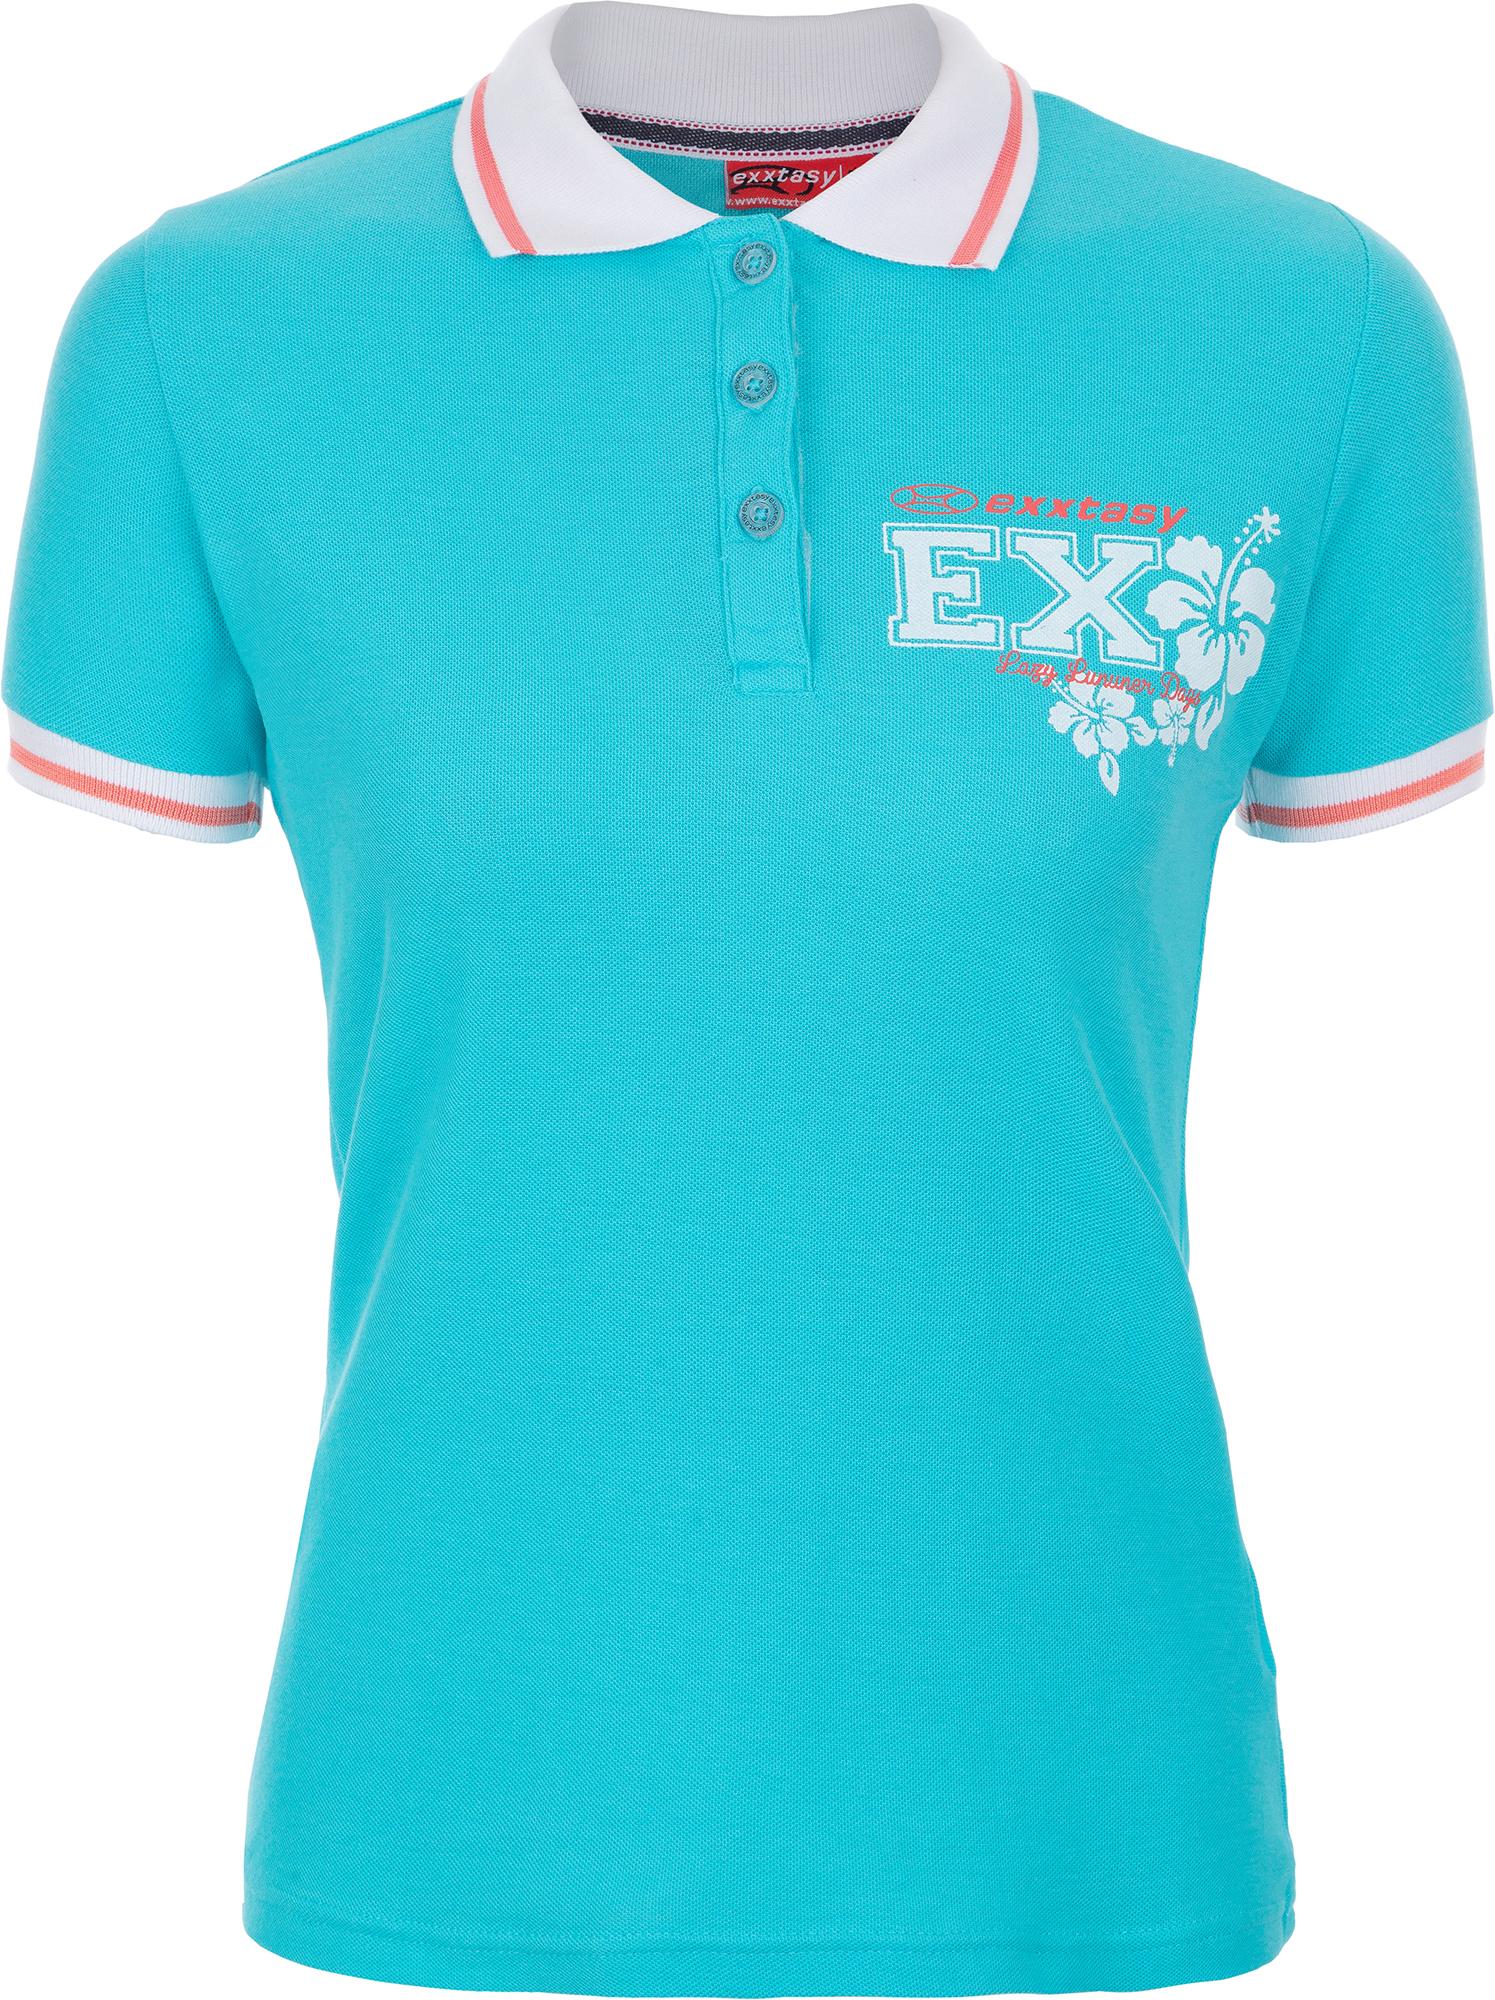 Exxtasy Поло женское Exxtasy Northcove, размер 50